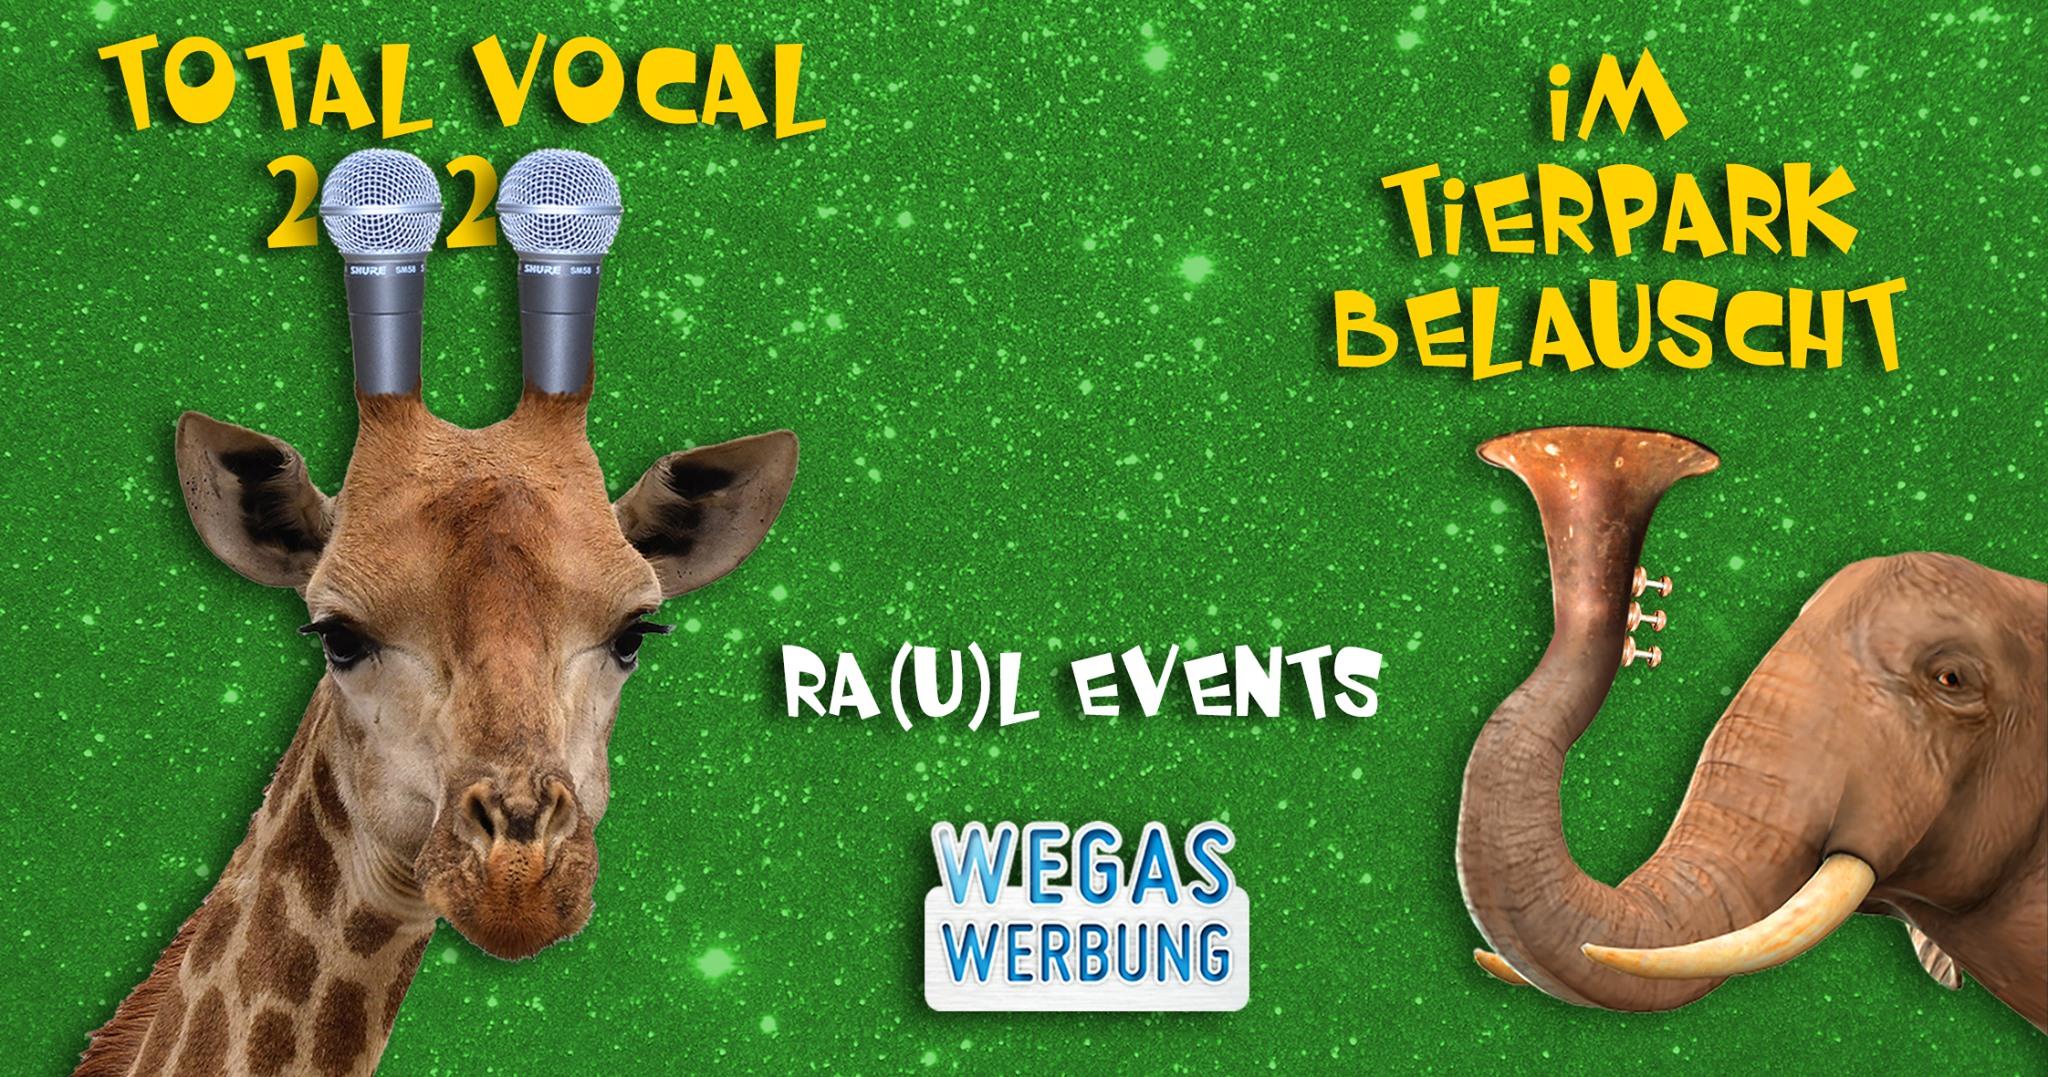 Raul Party Total Vocal 2020 Scheune Dresden Flyer